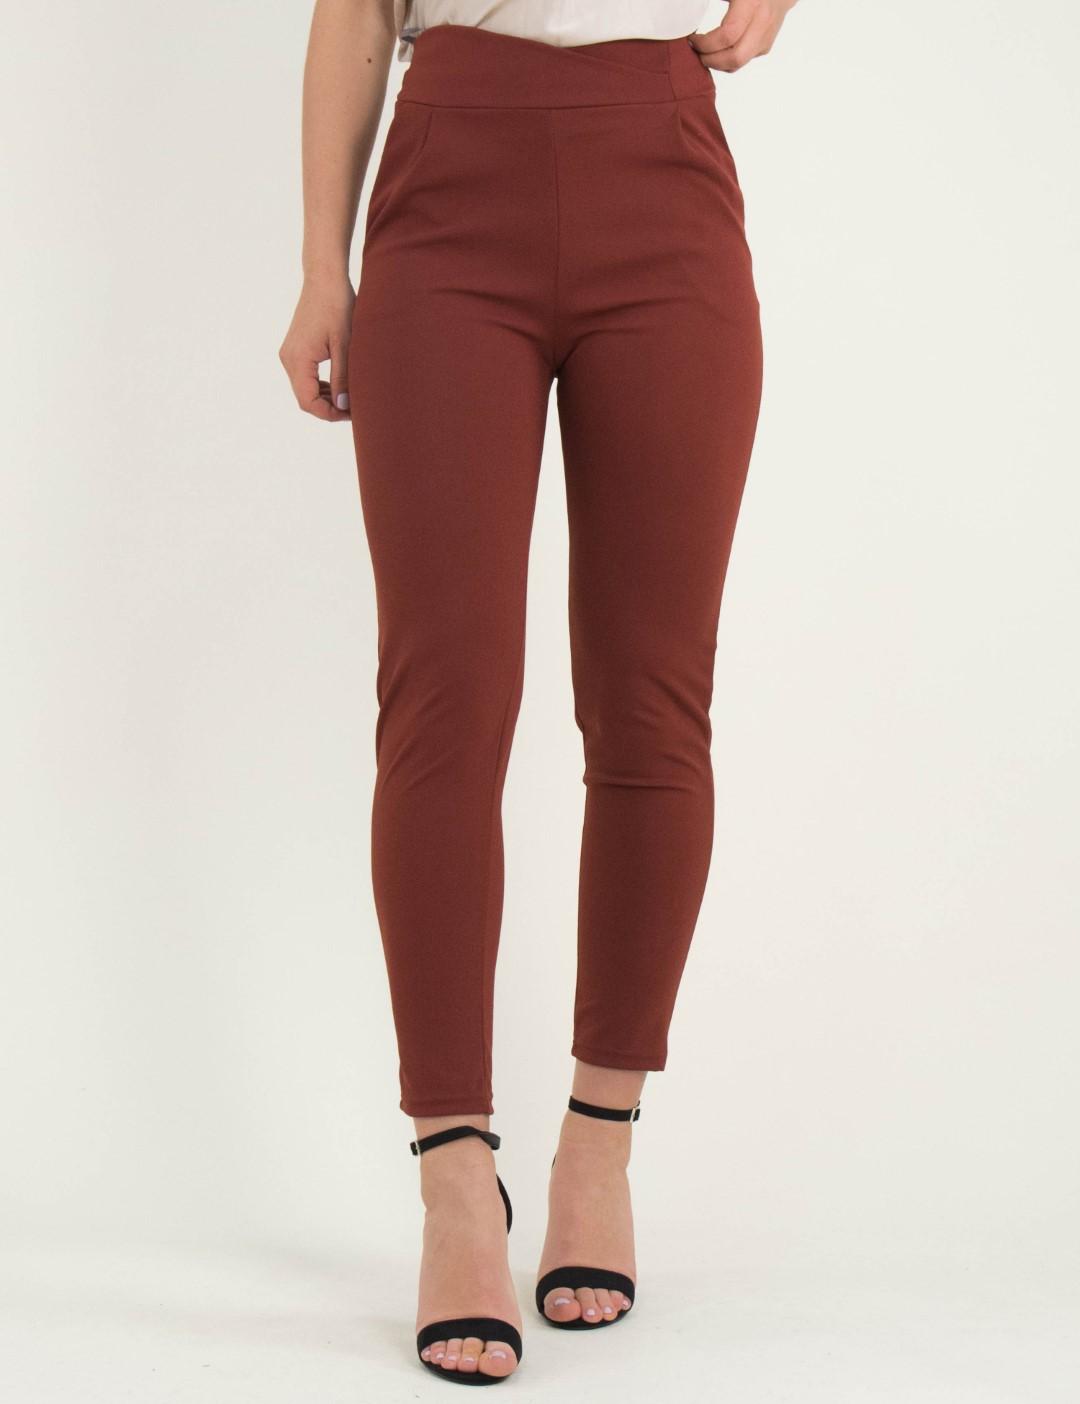 7951972e2899 Γυναικείο κεραμιδί ψηλόμεσο παντελόνι με τσέπες So Sexy 41148E